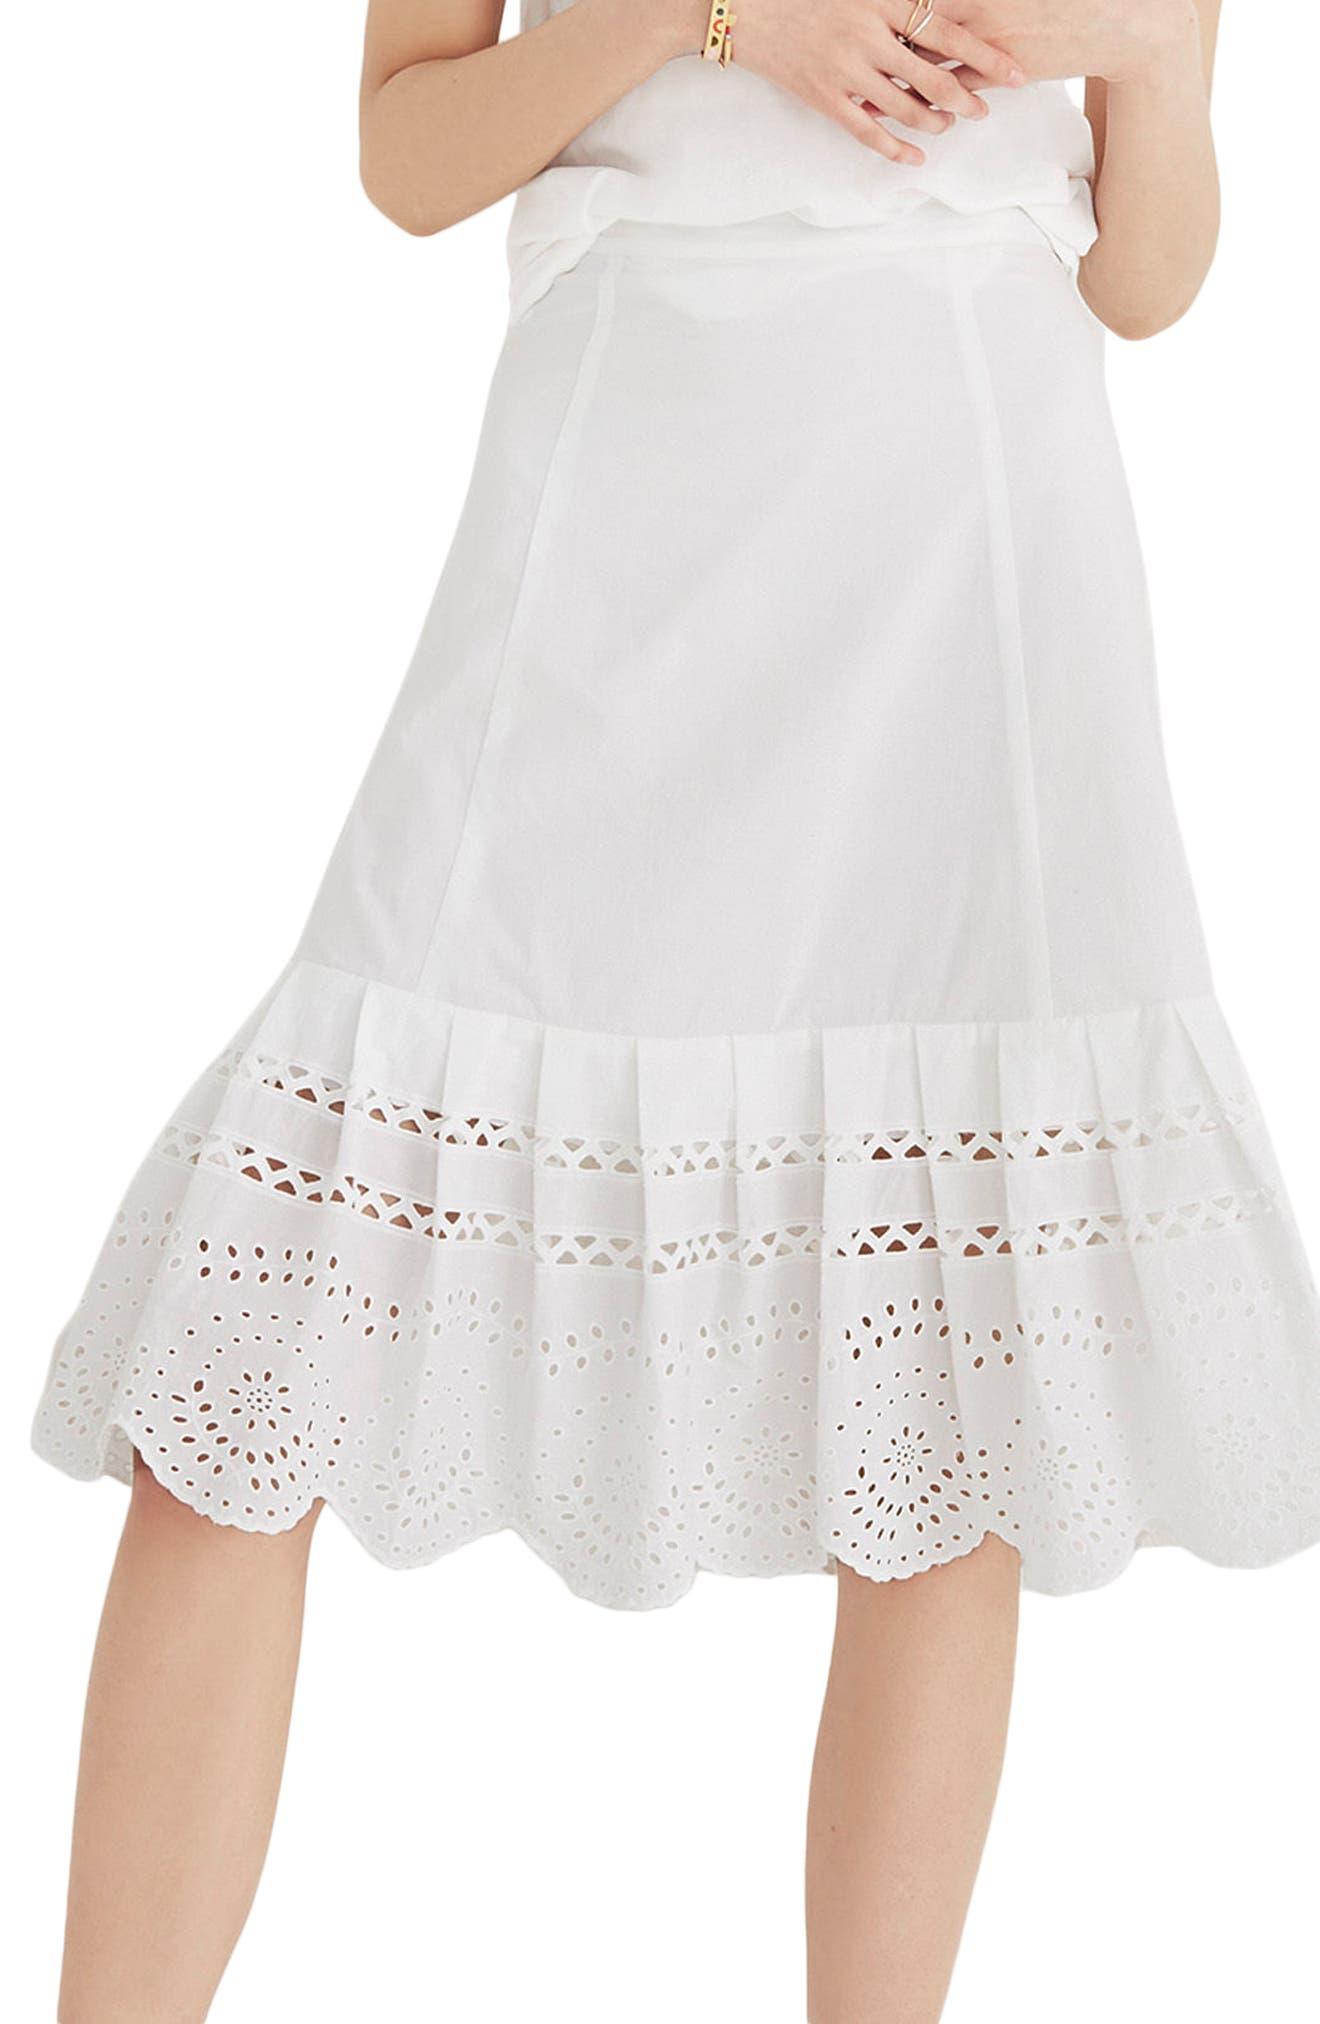 Eyelet Midi Skirt,                             Main thumbnail 1, color,                             Eyelet White